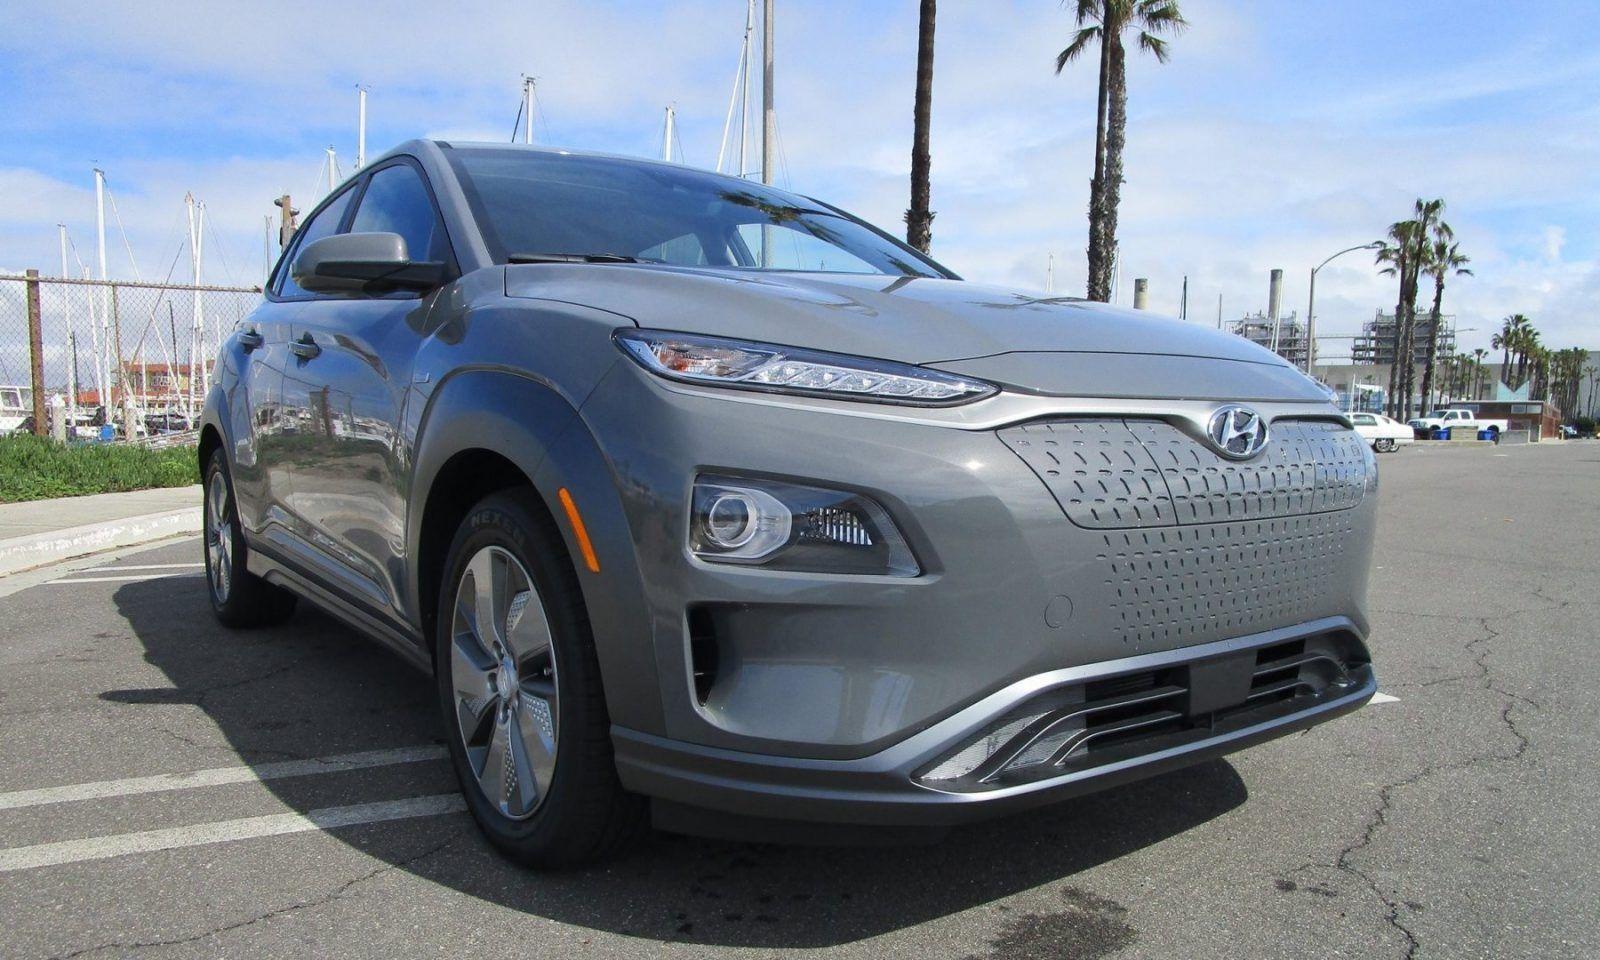 2019 hyundai kona electric road test review by ben lewis rh pinterest com